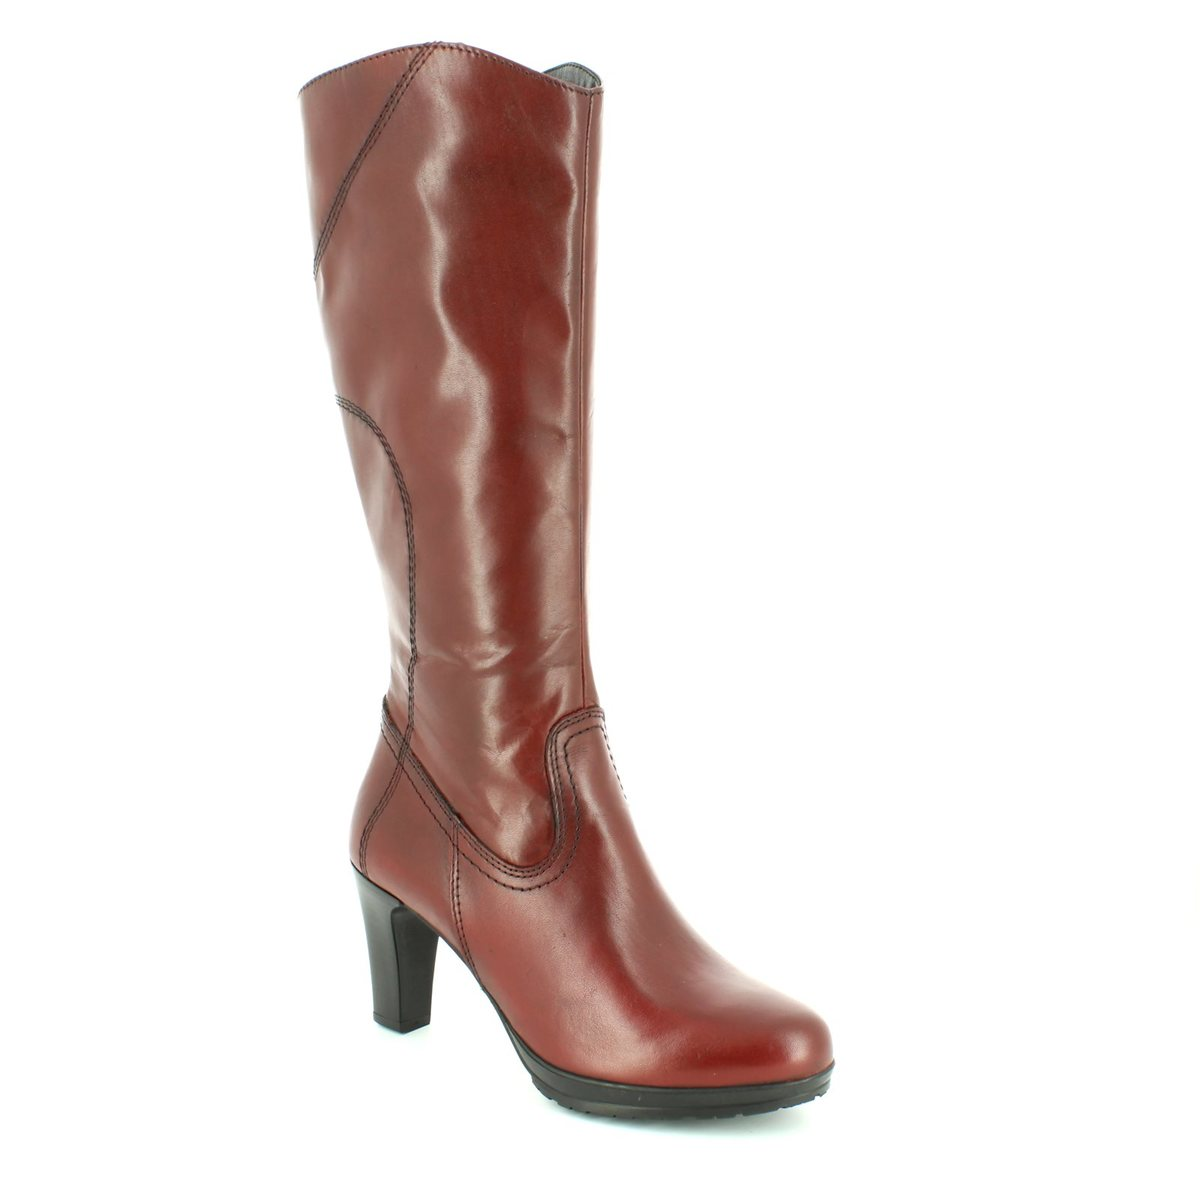 d9f09284c00 Tamaris Knee-high Boots - Wine - 25547 549 CARMEN